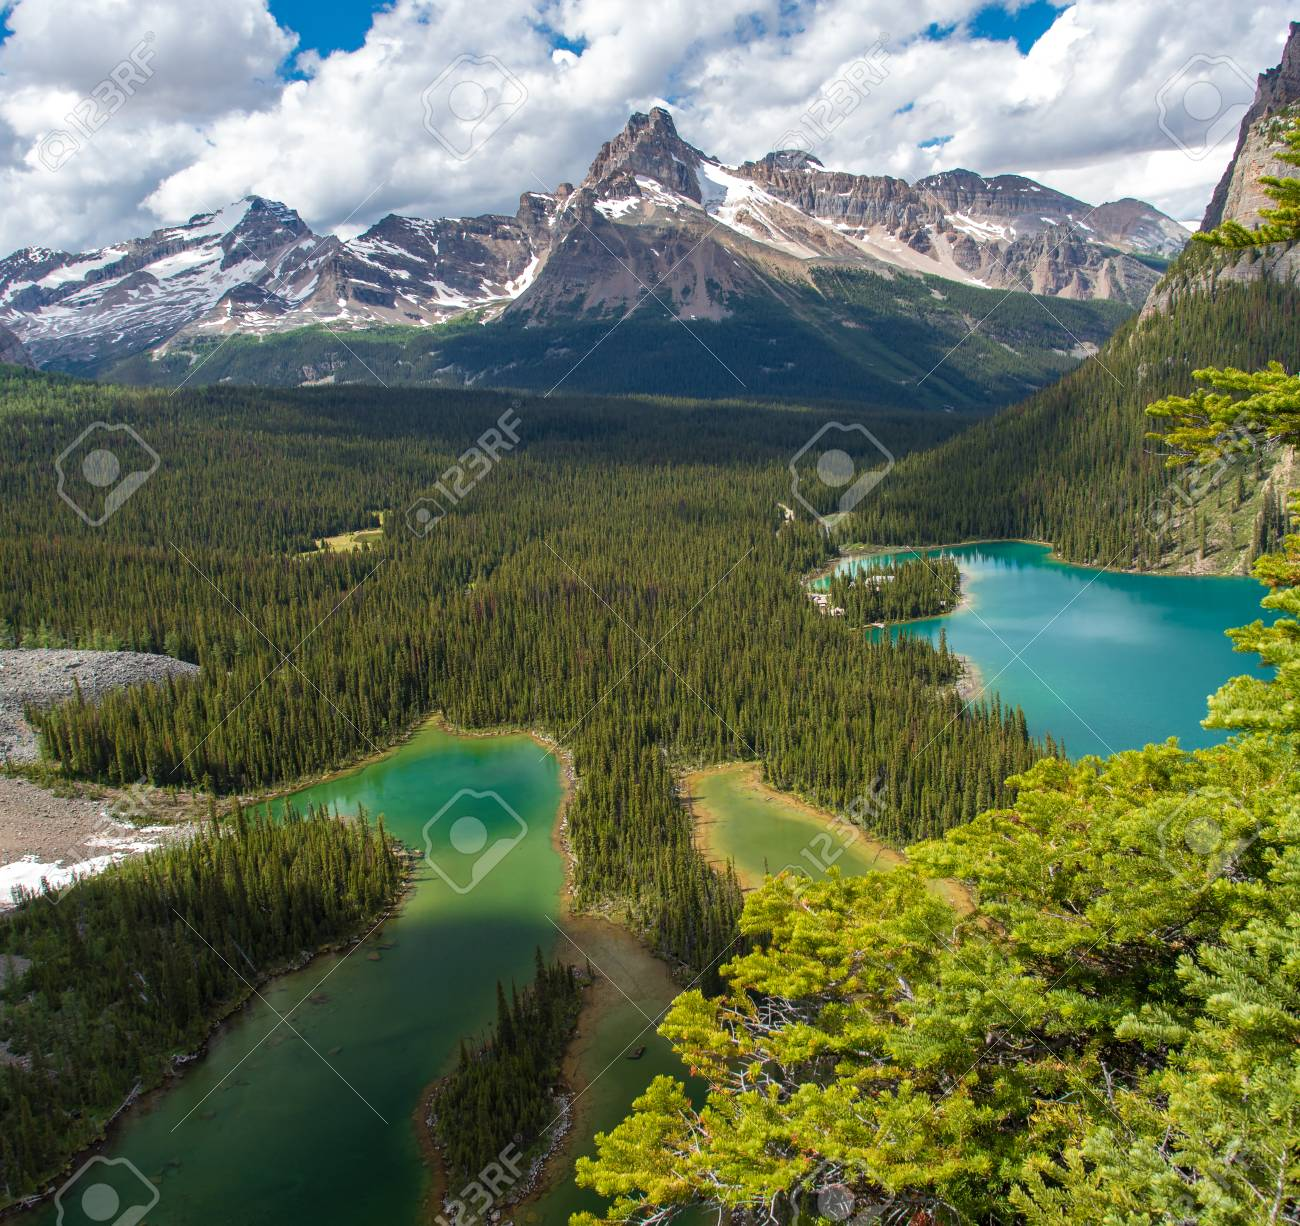 Opabin lake beautiful hiking trail in cloudy day in Spring, Yoho, Canada. - 115503221